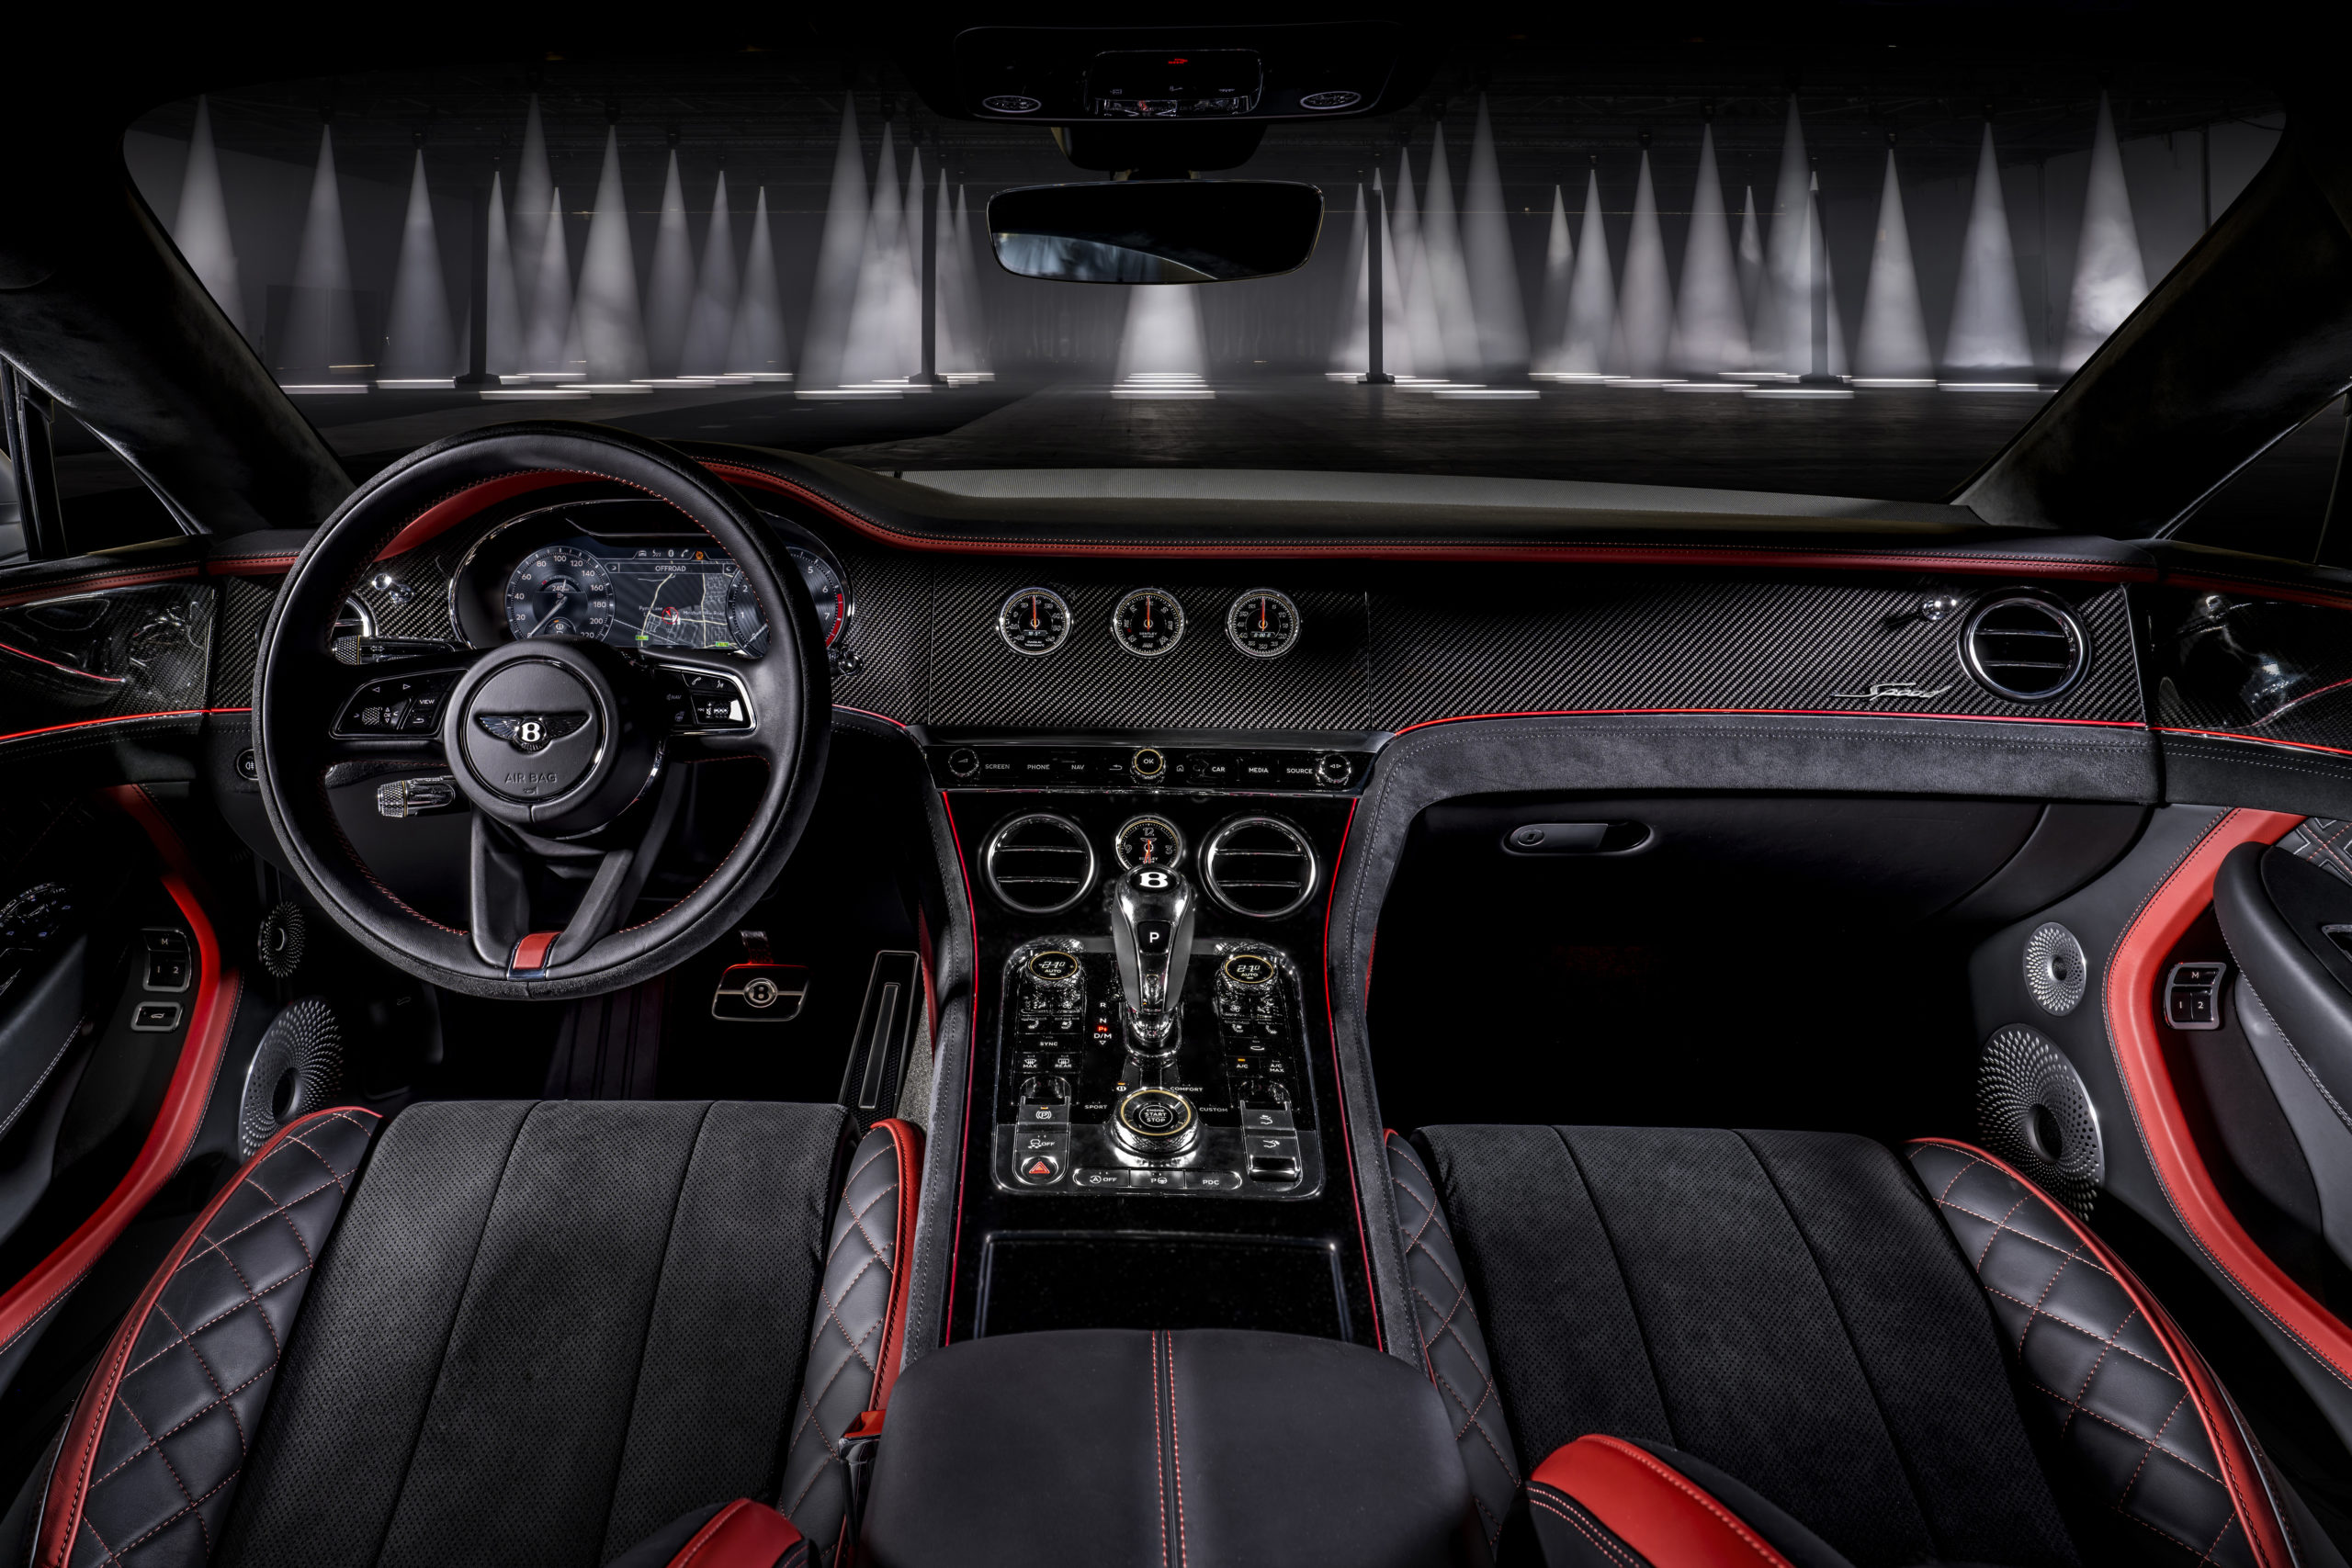 2022 Bentley Continental GT Speed 22-inch interior